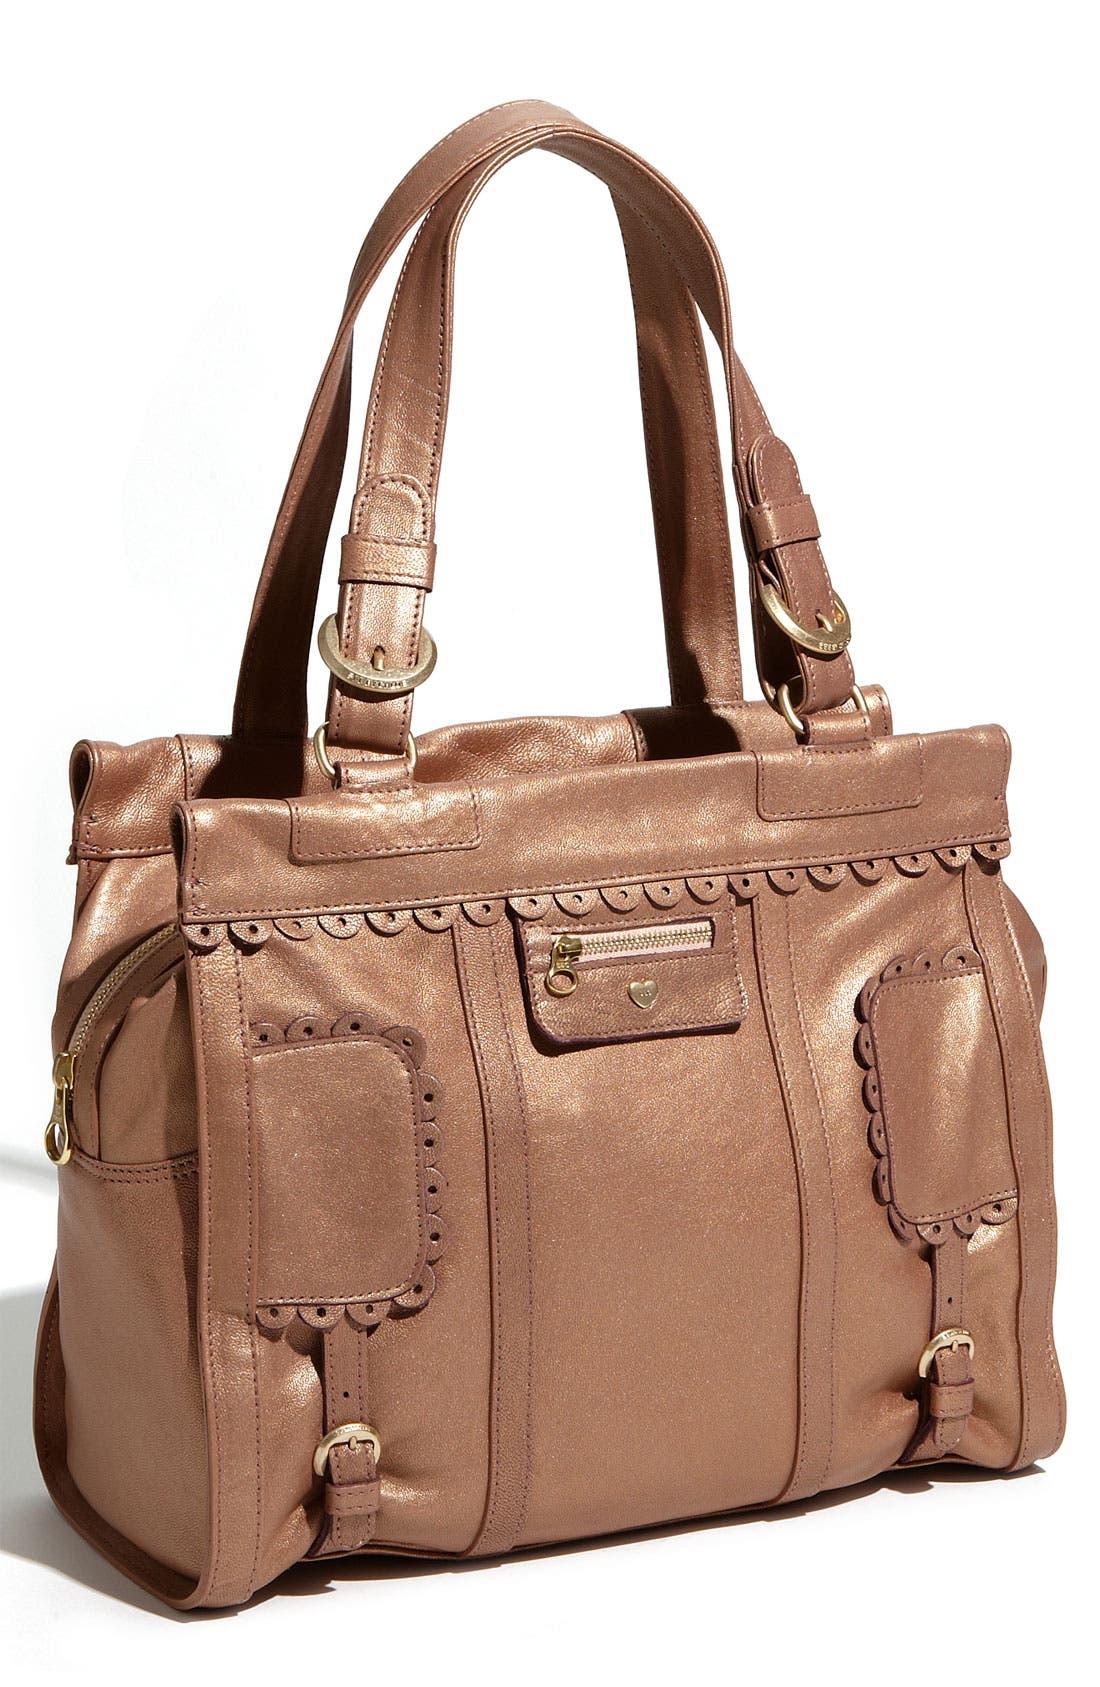 Alternate Image 1 Selected - See By Chloé 'Poya Metallic Vintage' Leather Shoulder Bag